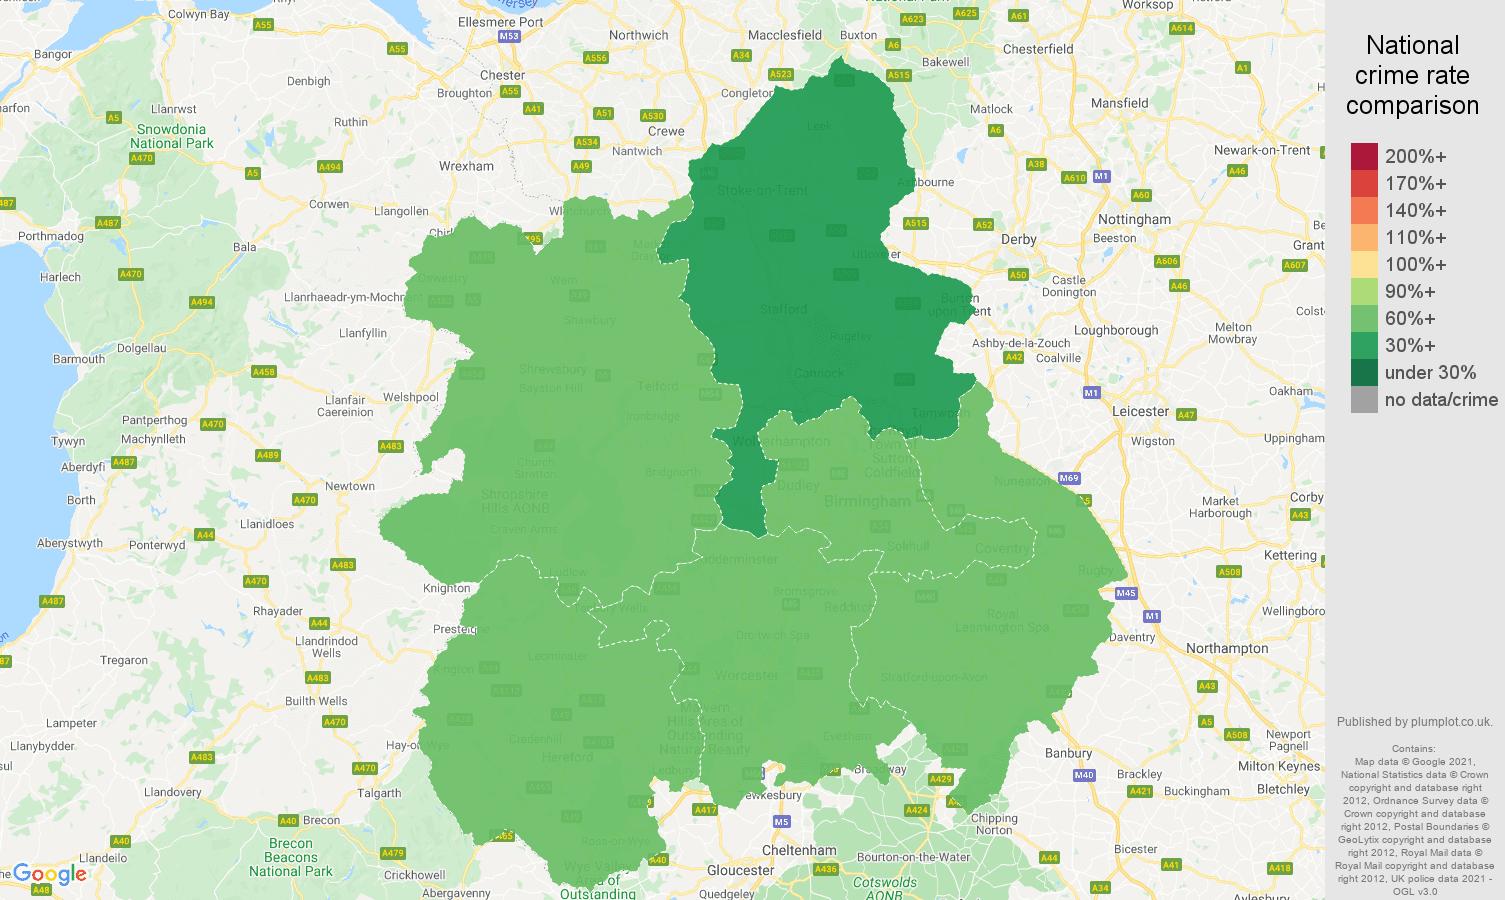 West Midlands drugs crime rate comparison map